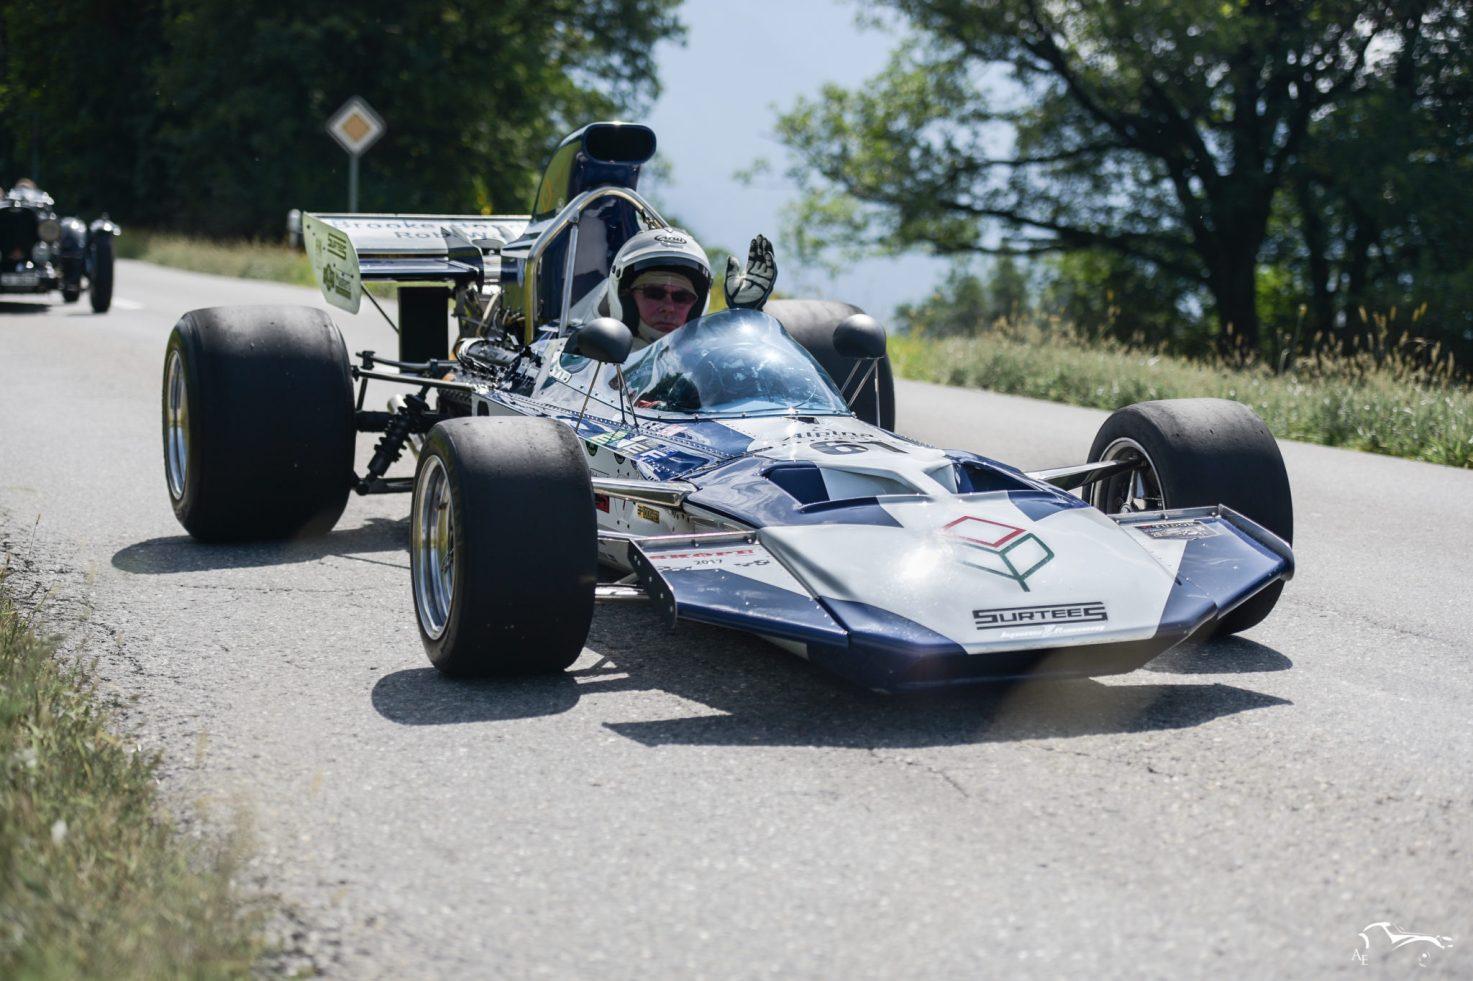 Surtees TS9 2993 cc 1971